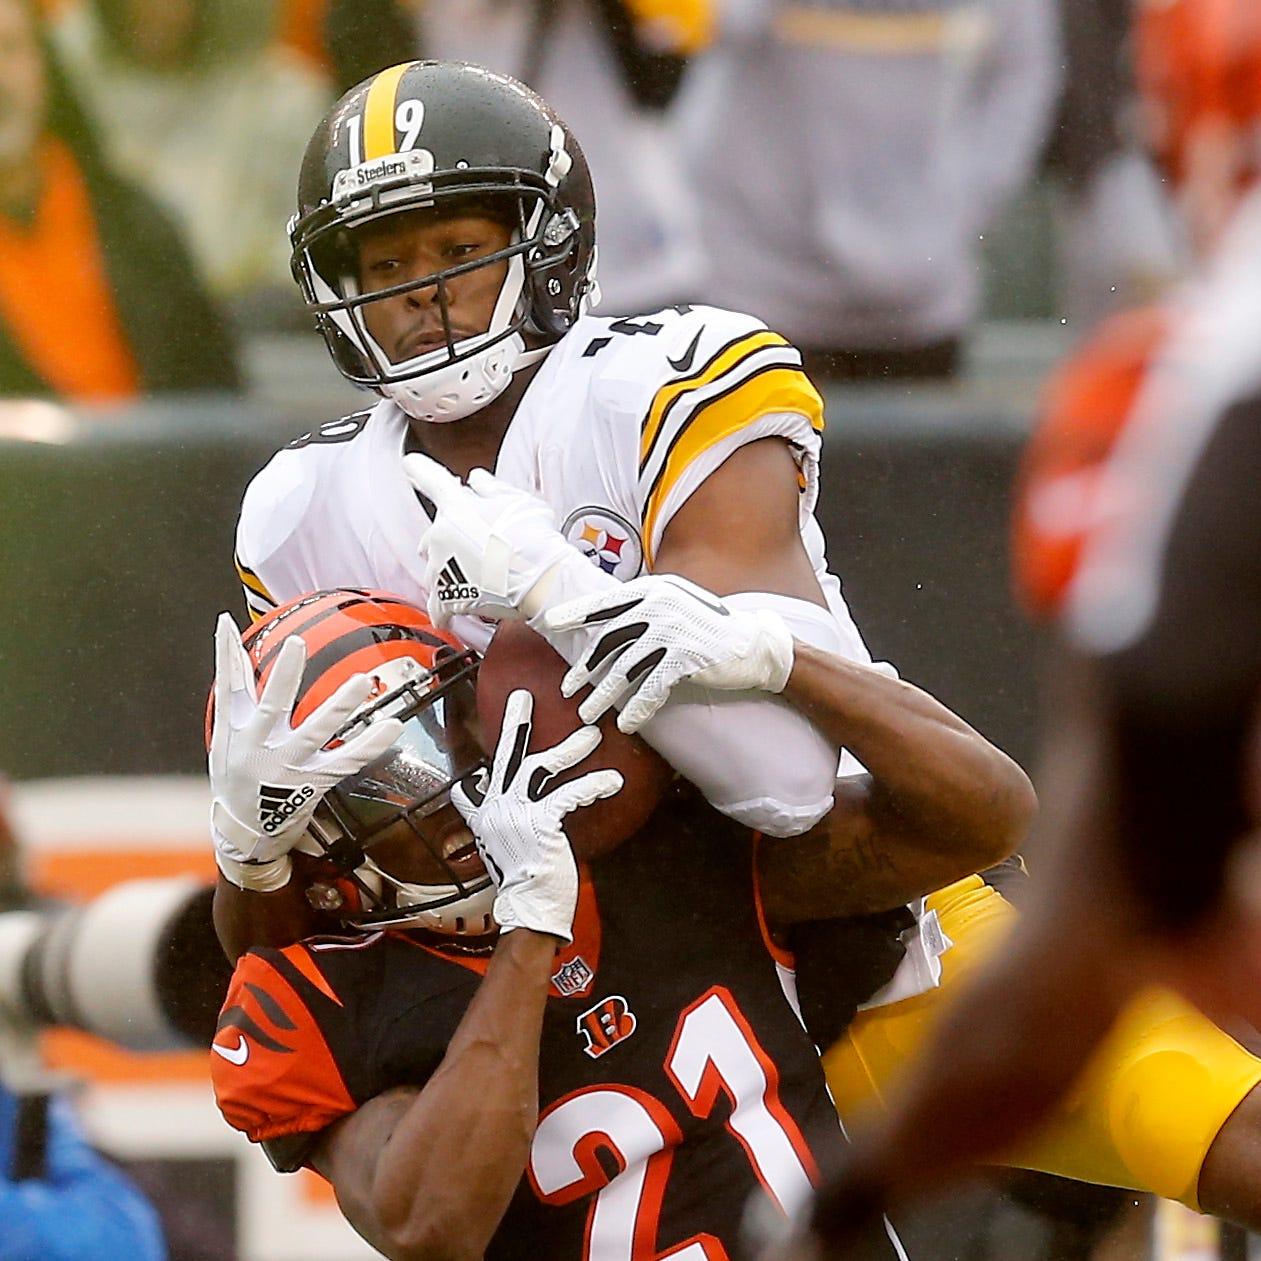 Pittsburgh Steelers score late touchdown to beat Cincinnati Bengals